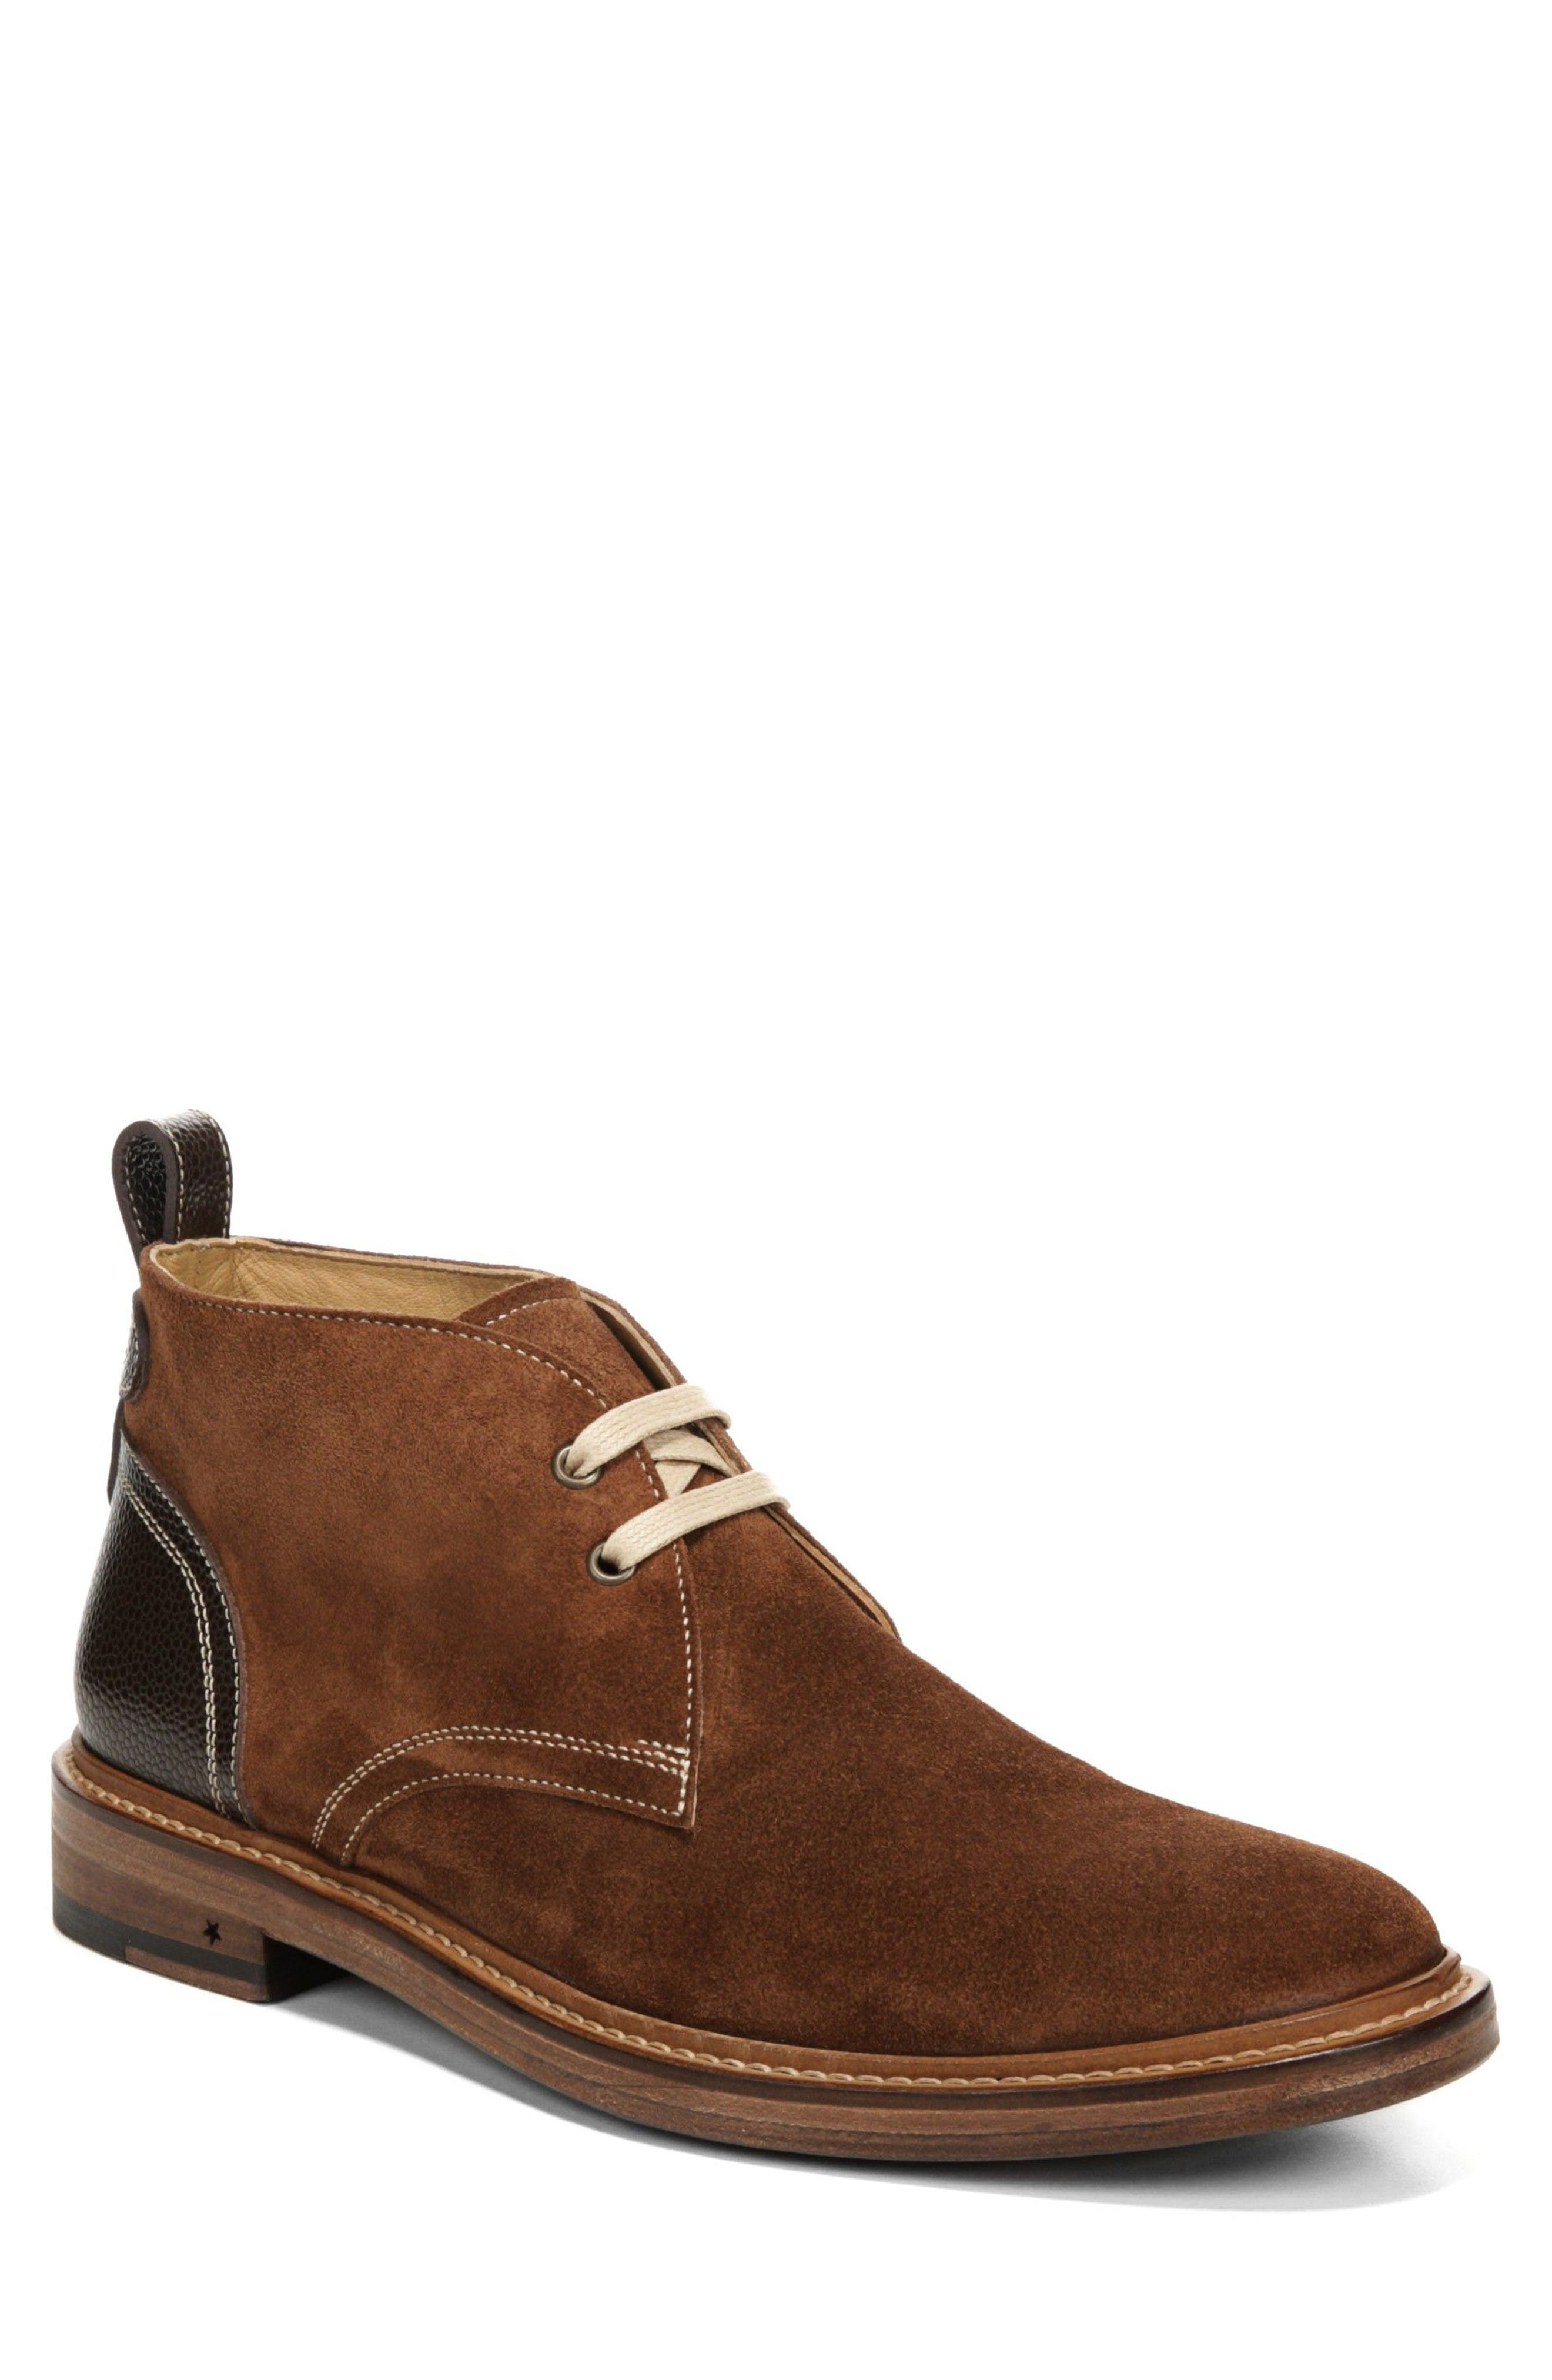 George Brown BILT 'Fulton' Chukka Boot (Men)